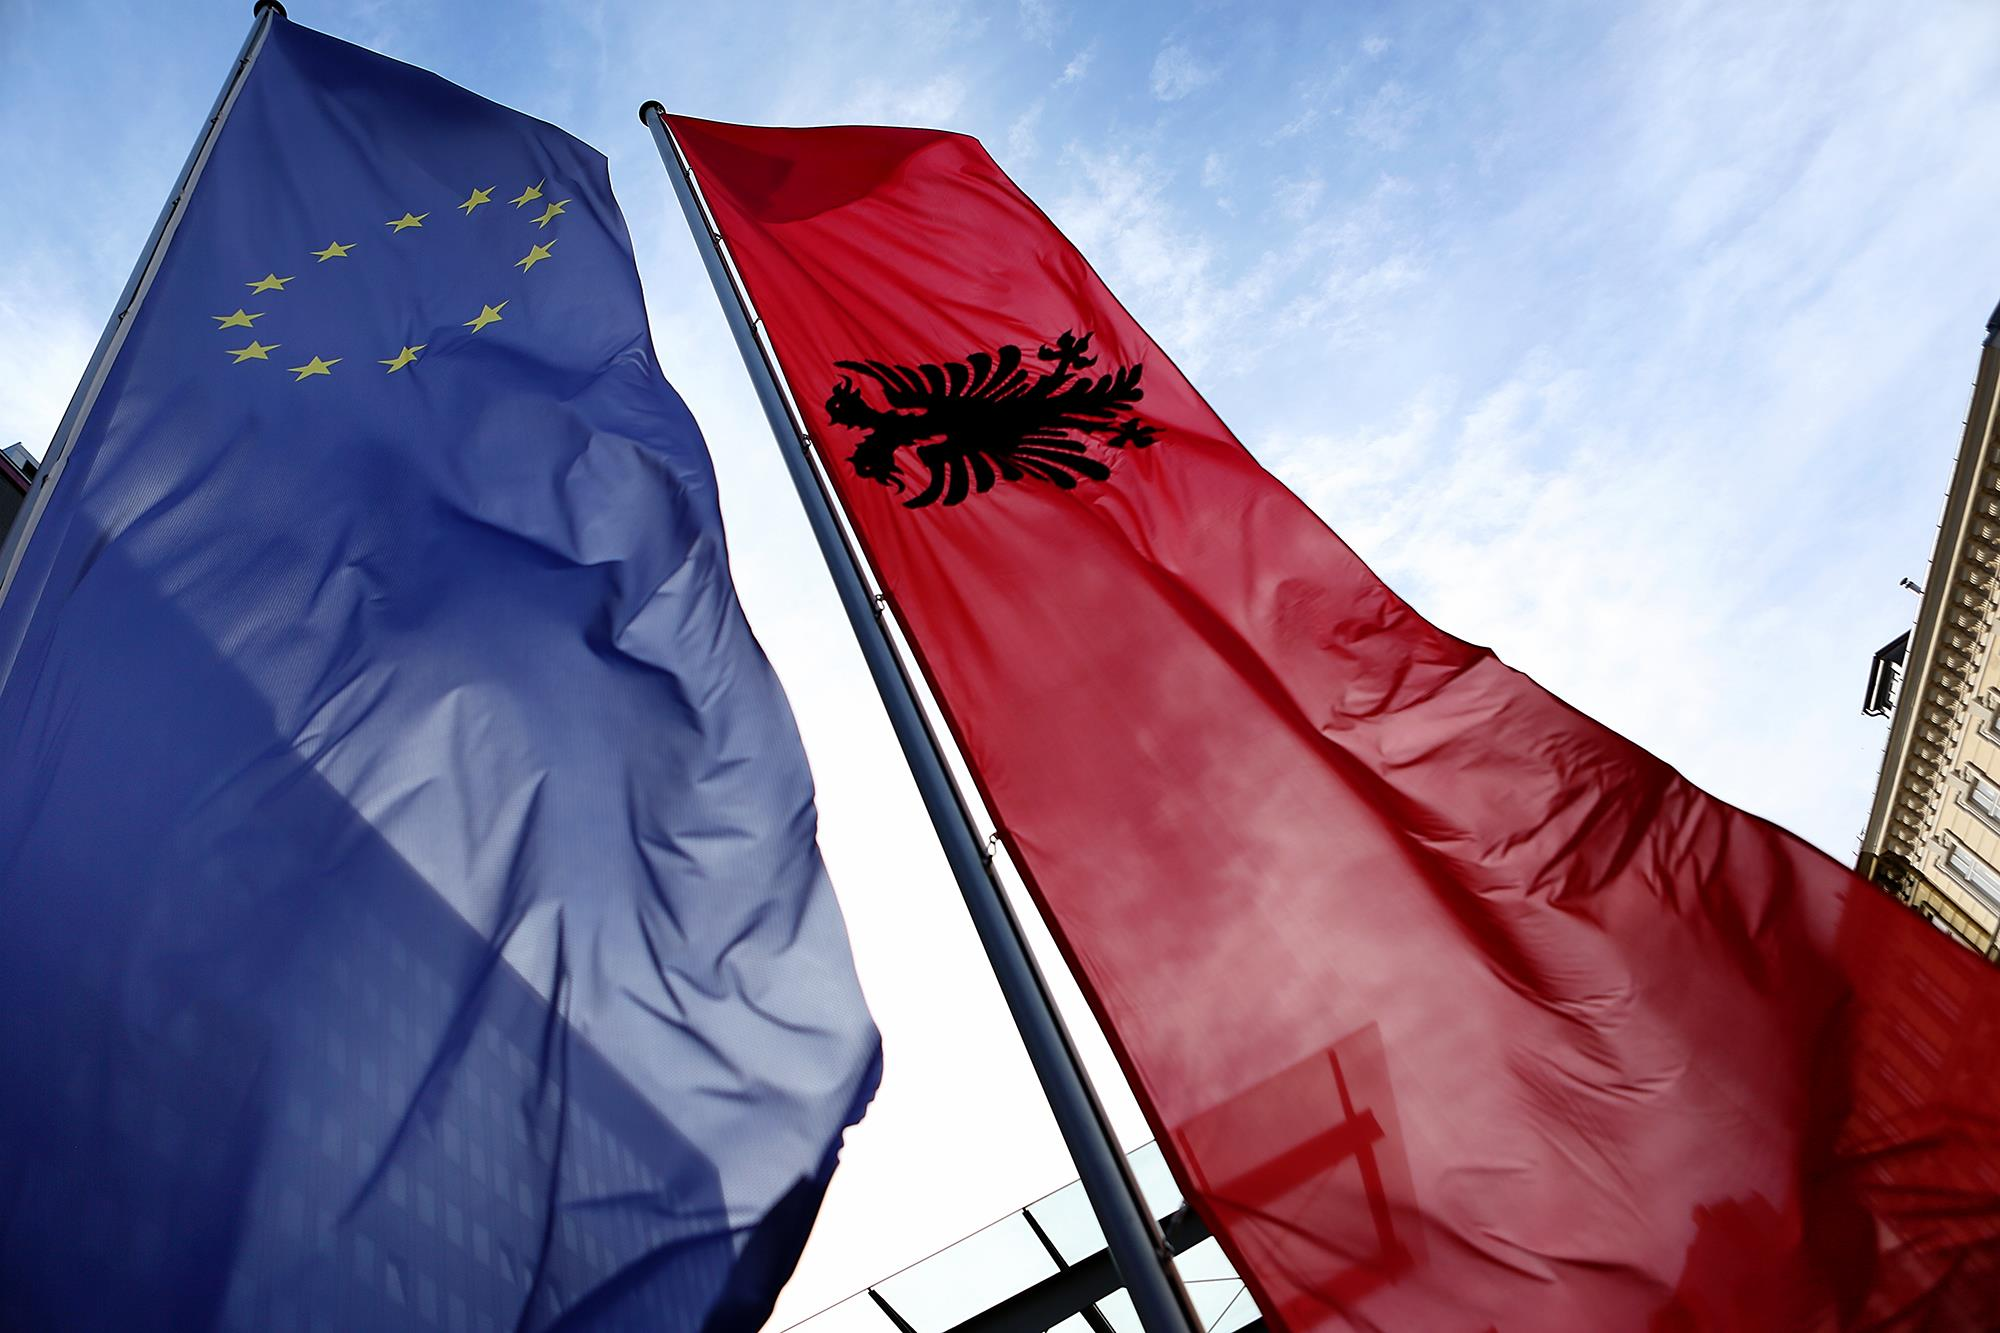 BiEPAG's Experts React: EC 2020 Progress Report on Albania